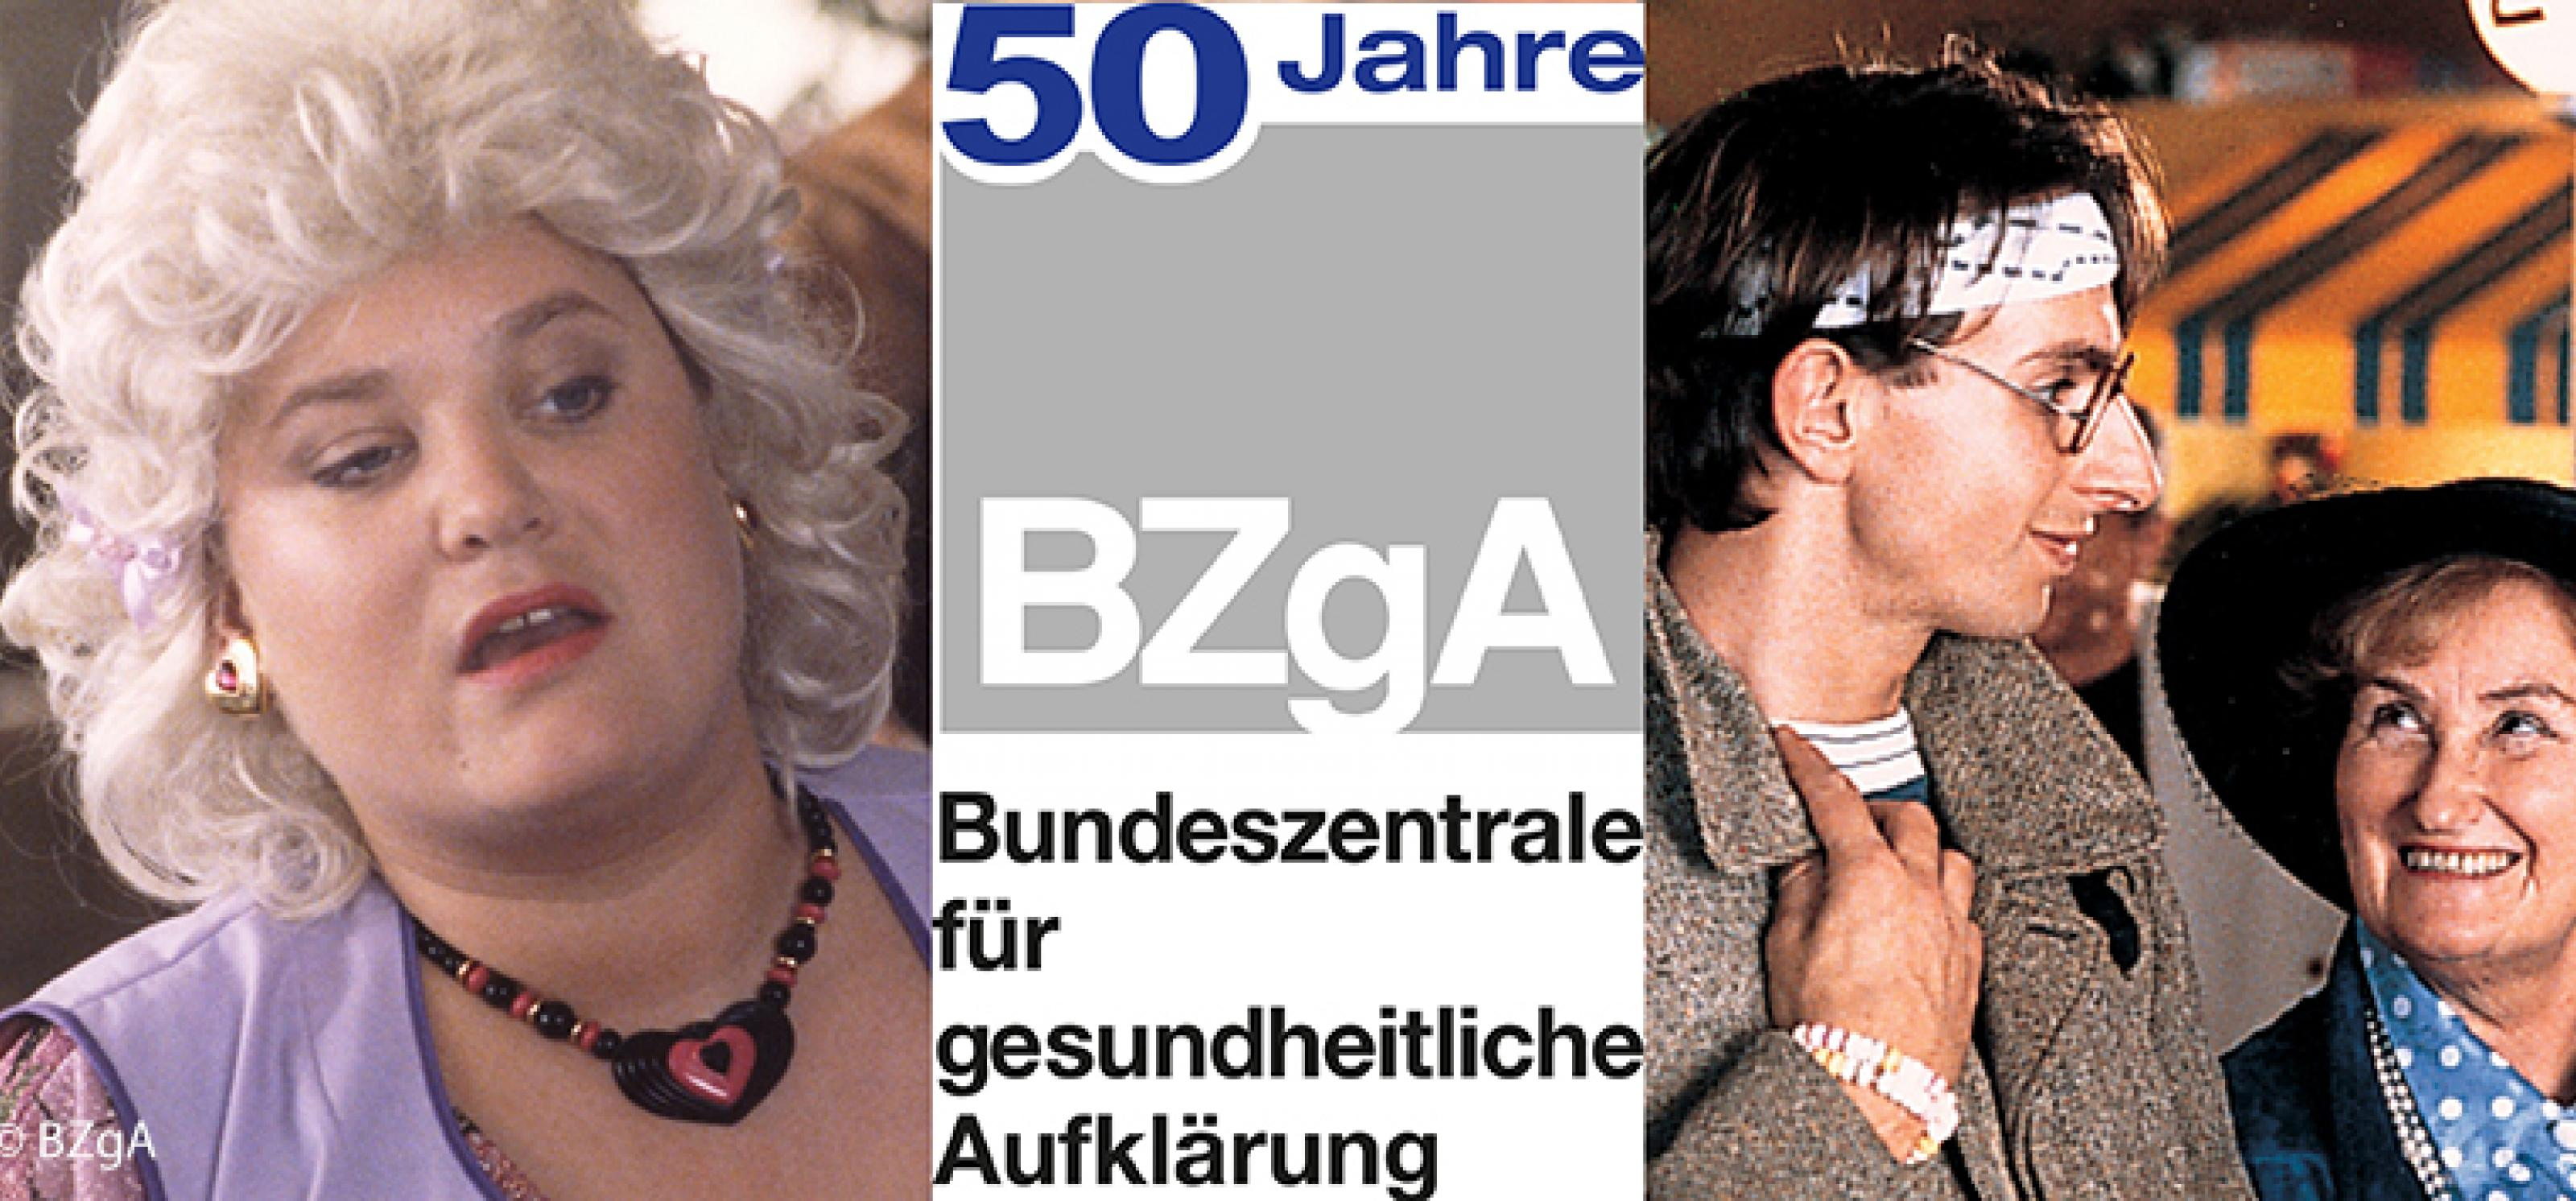 50 Jahre BZgA